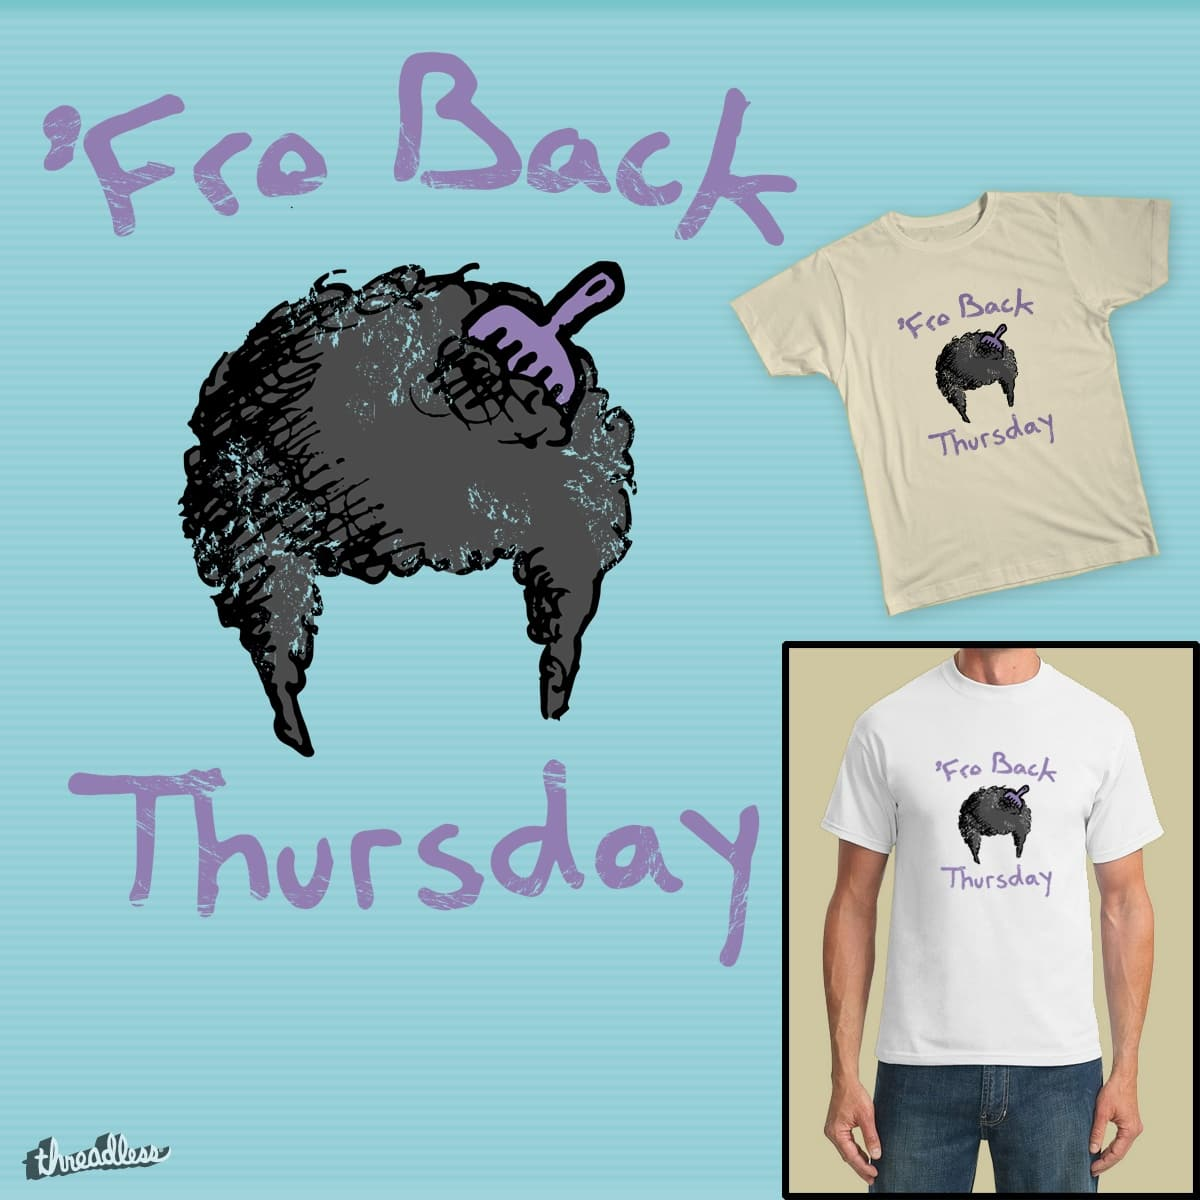 'Froback Thursday by HerrDuff on Threadless